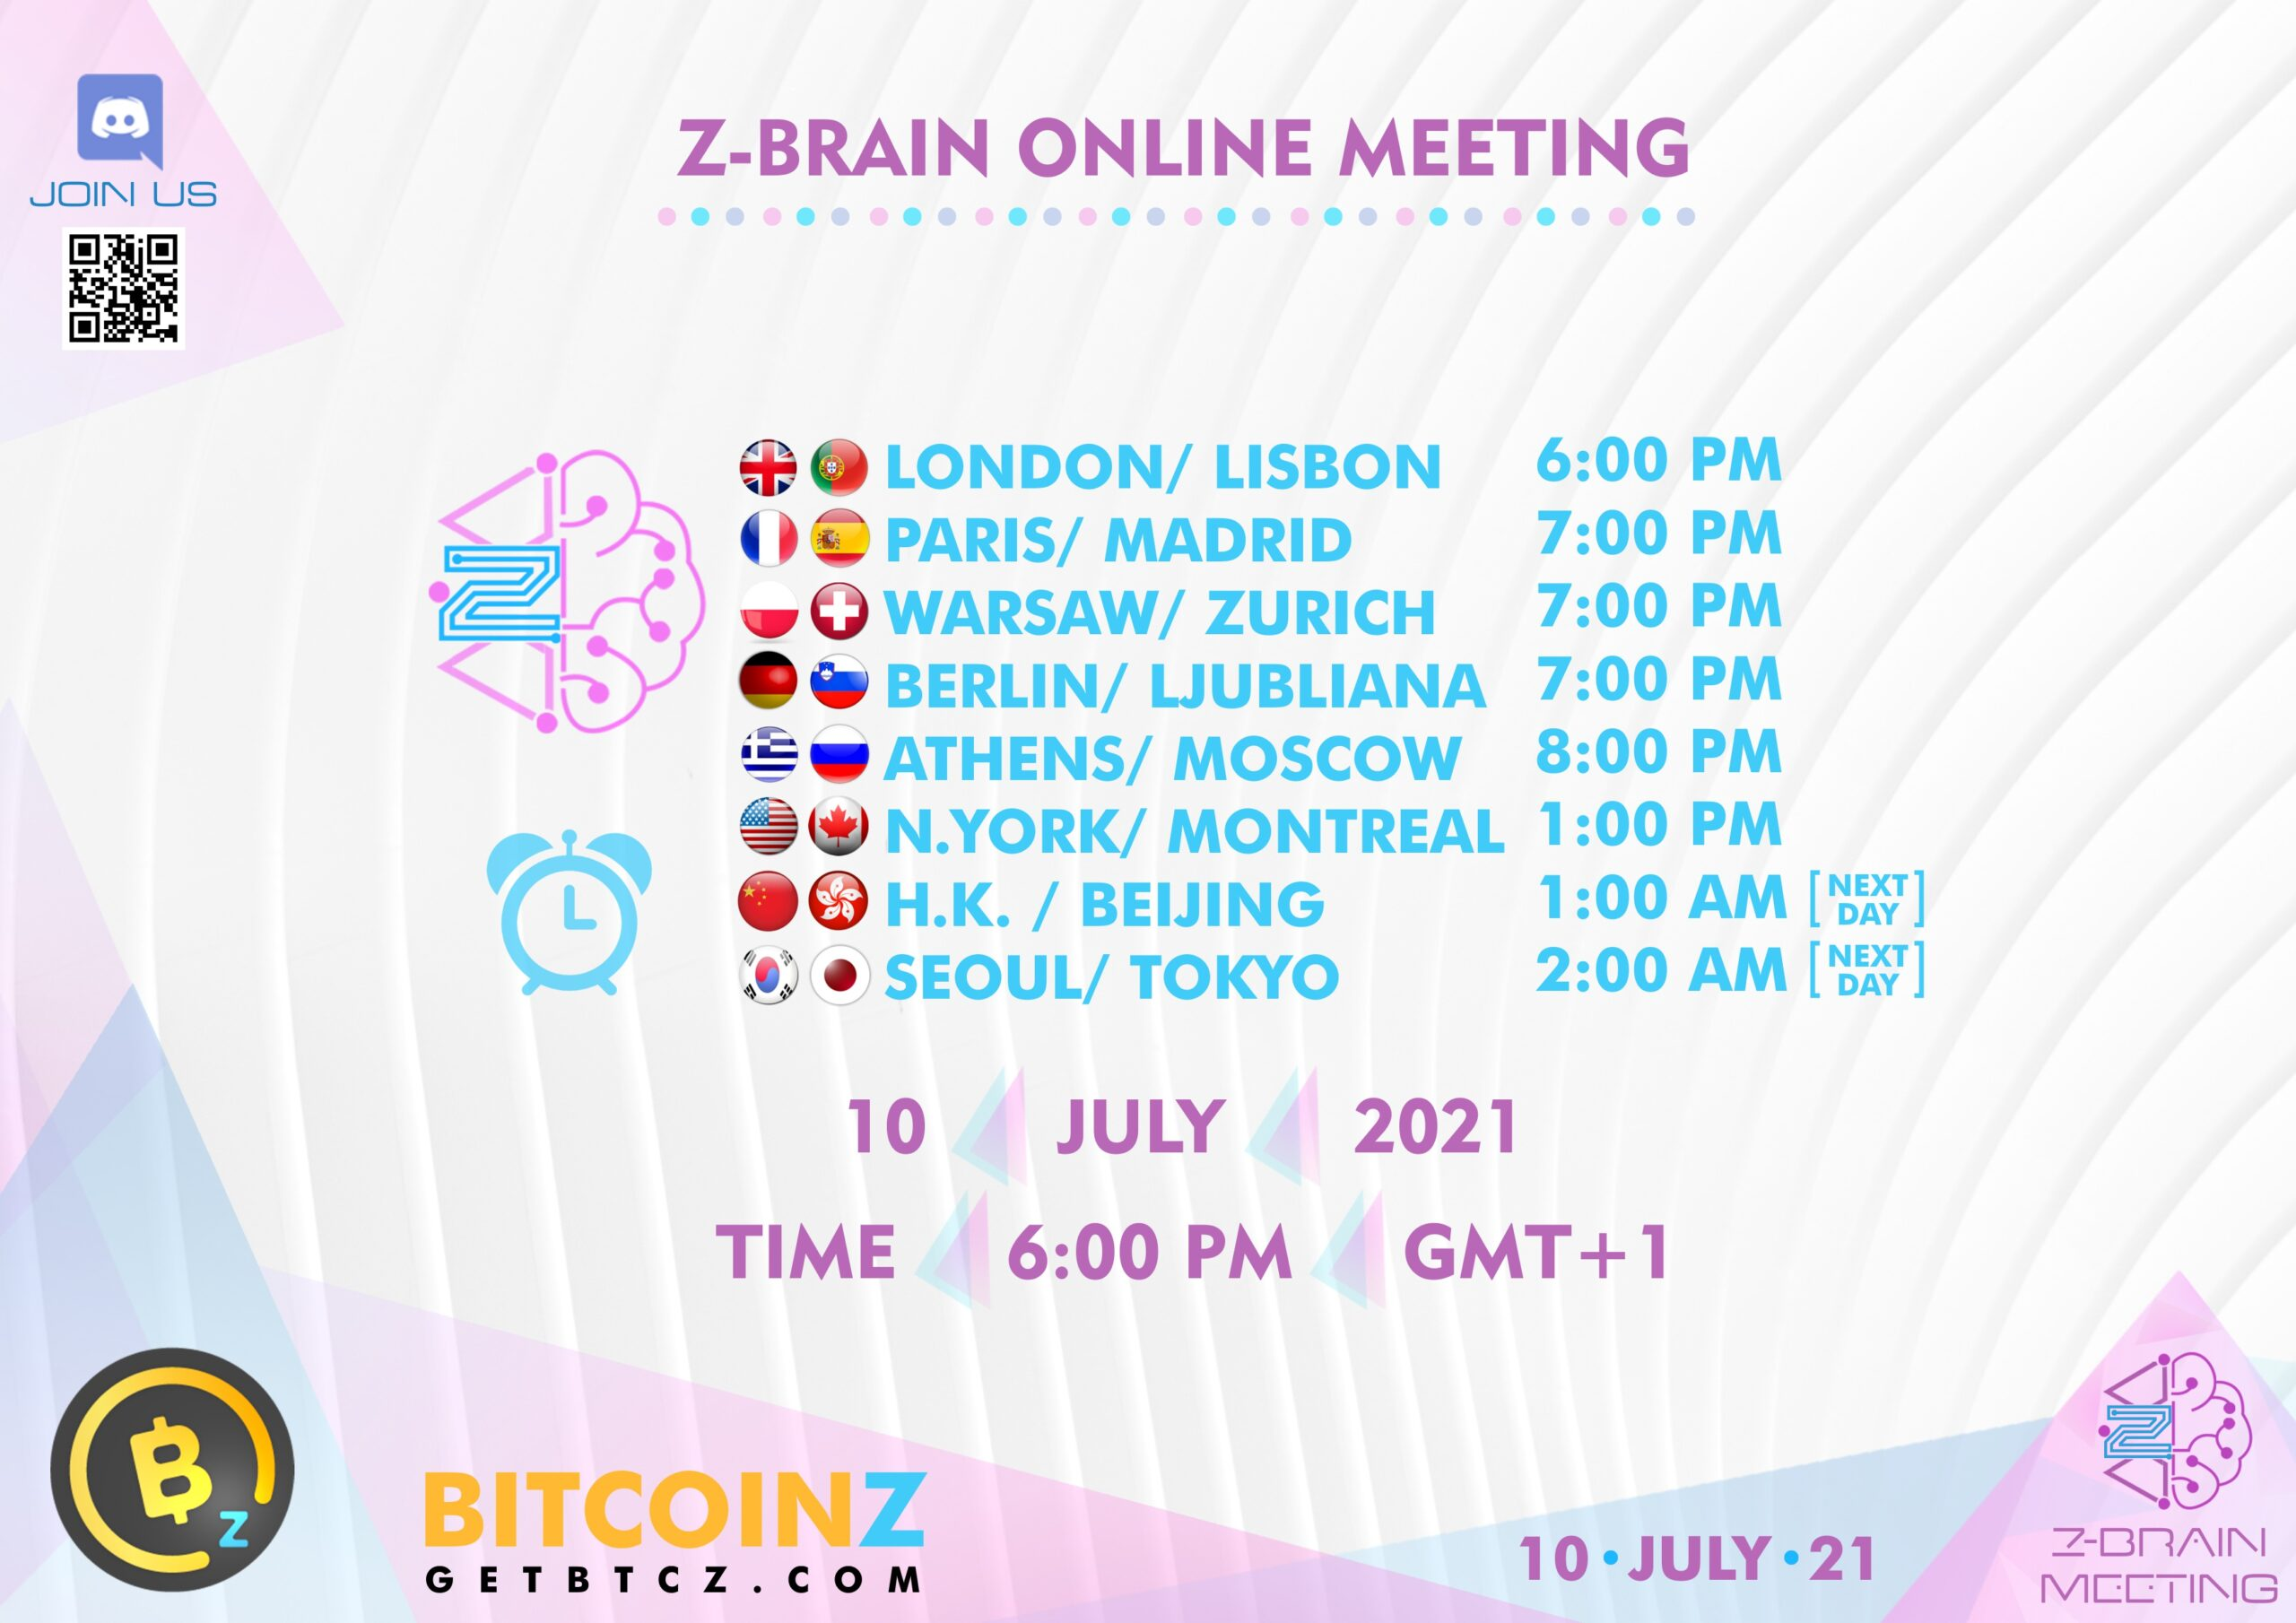 ZBrain Meeting July 10 2021